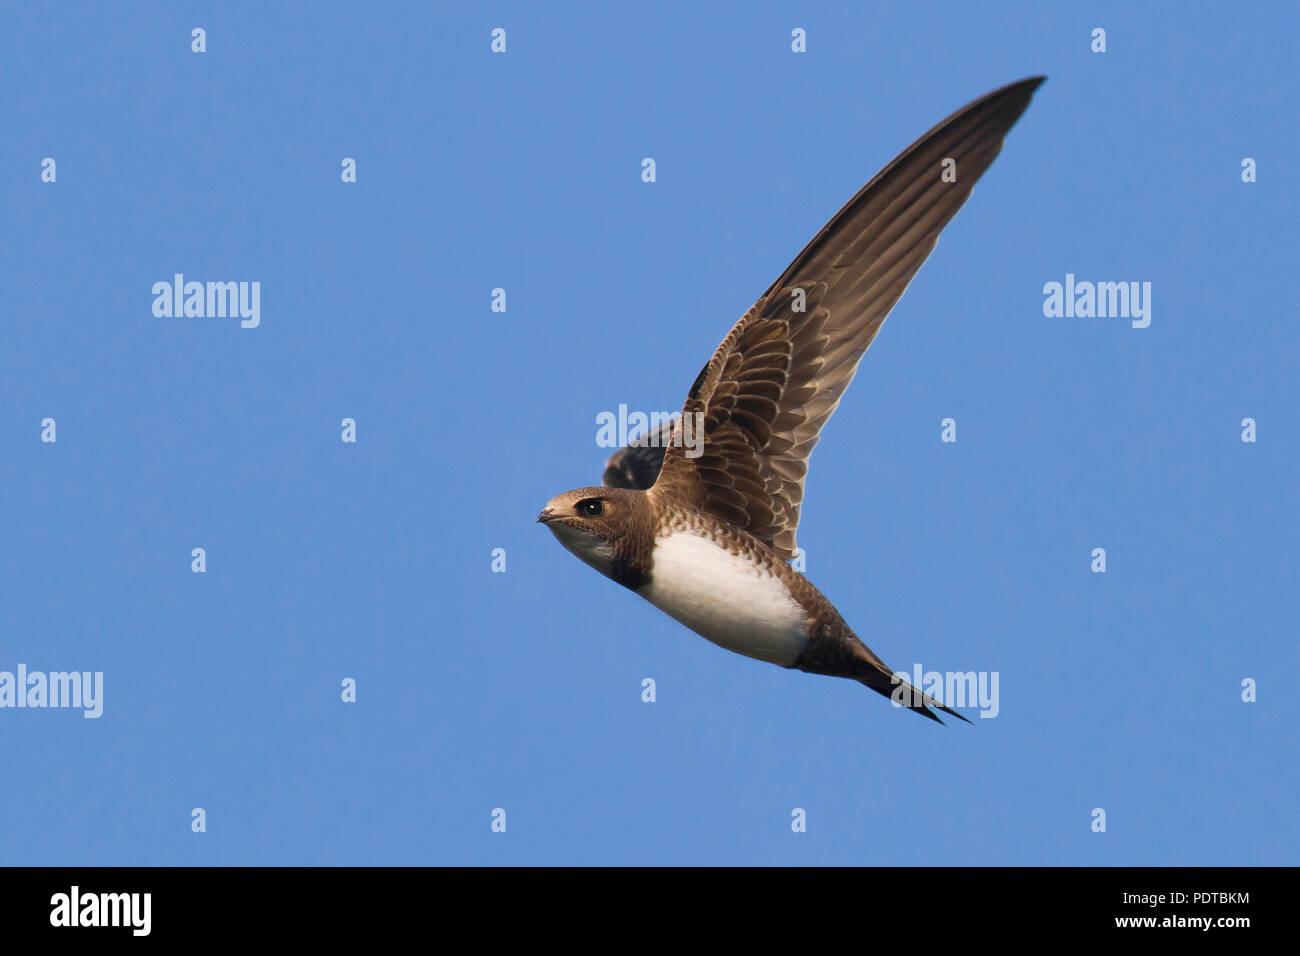 Alpine Swift flying across a blue sky. Stock Photo